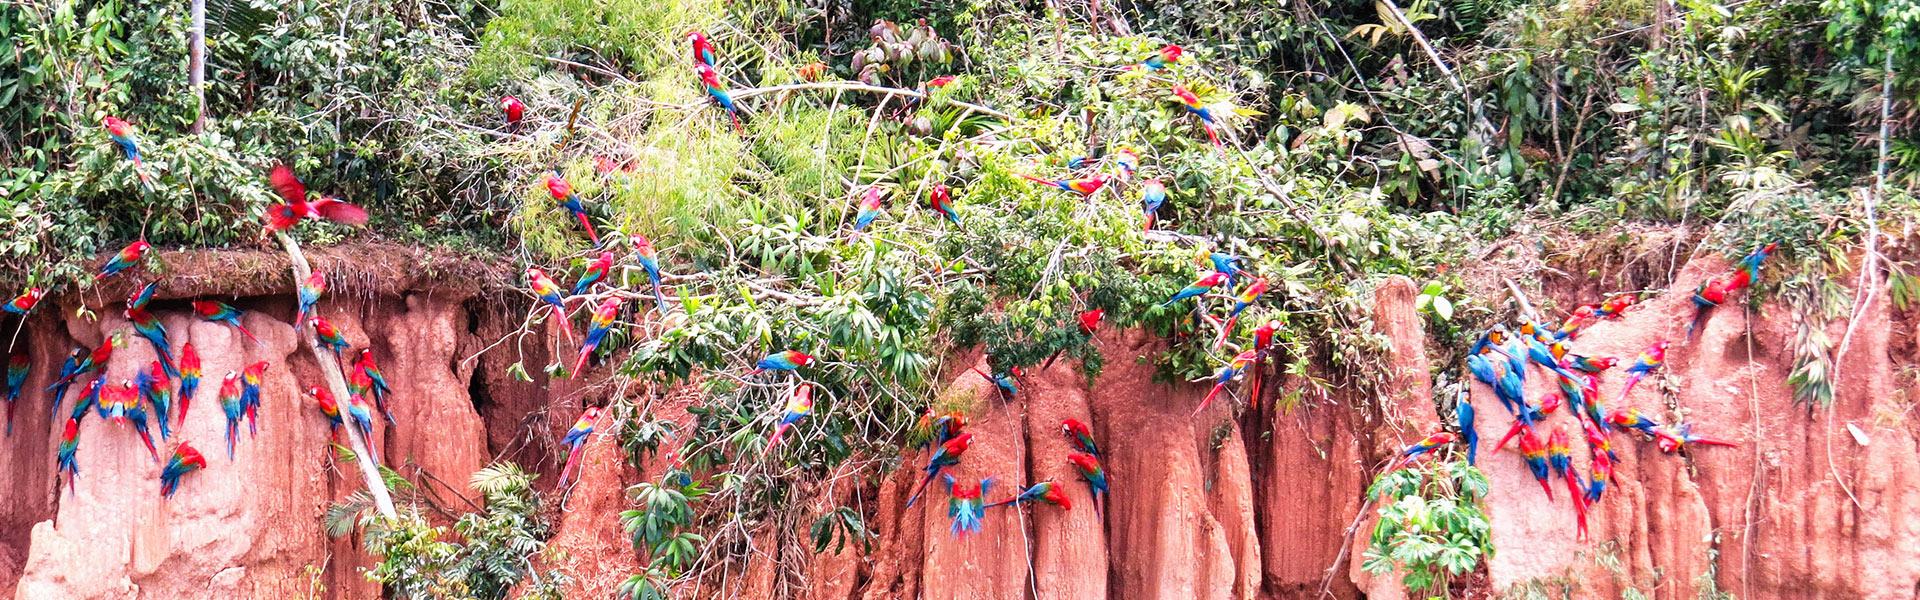 Selva Cultural y de Aventura